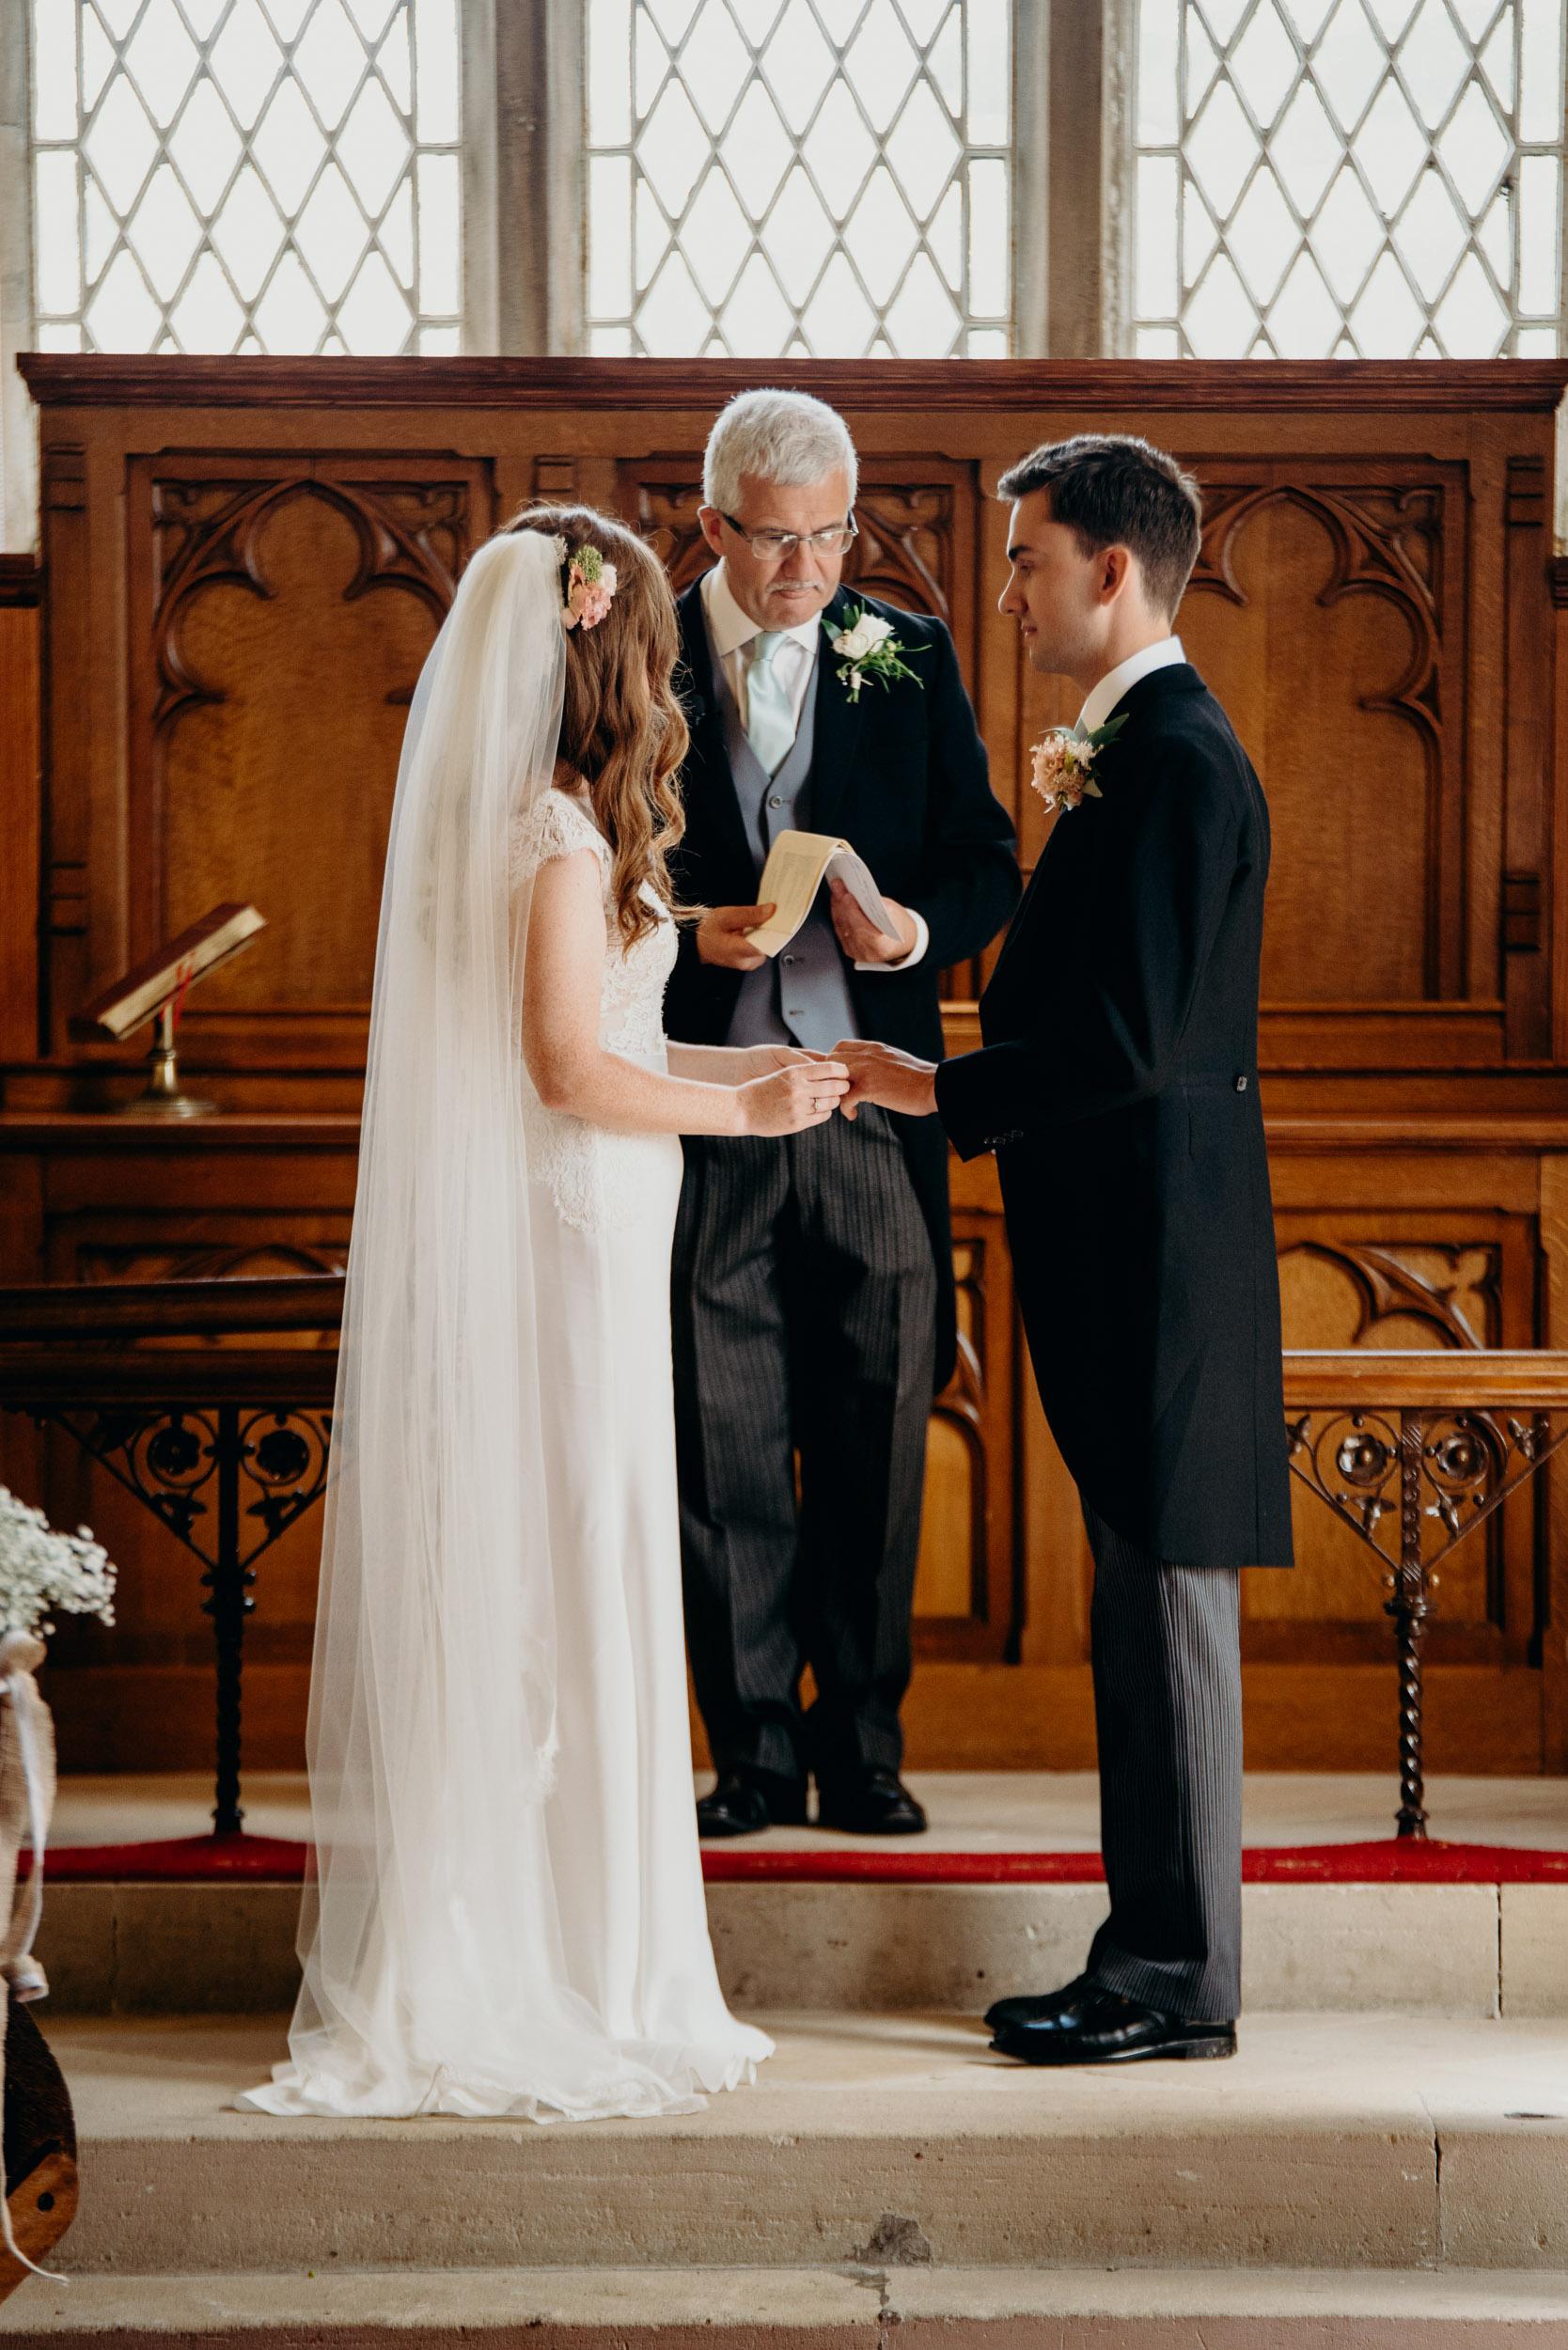 drenagh estate wedding photography-51.jpg